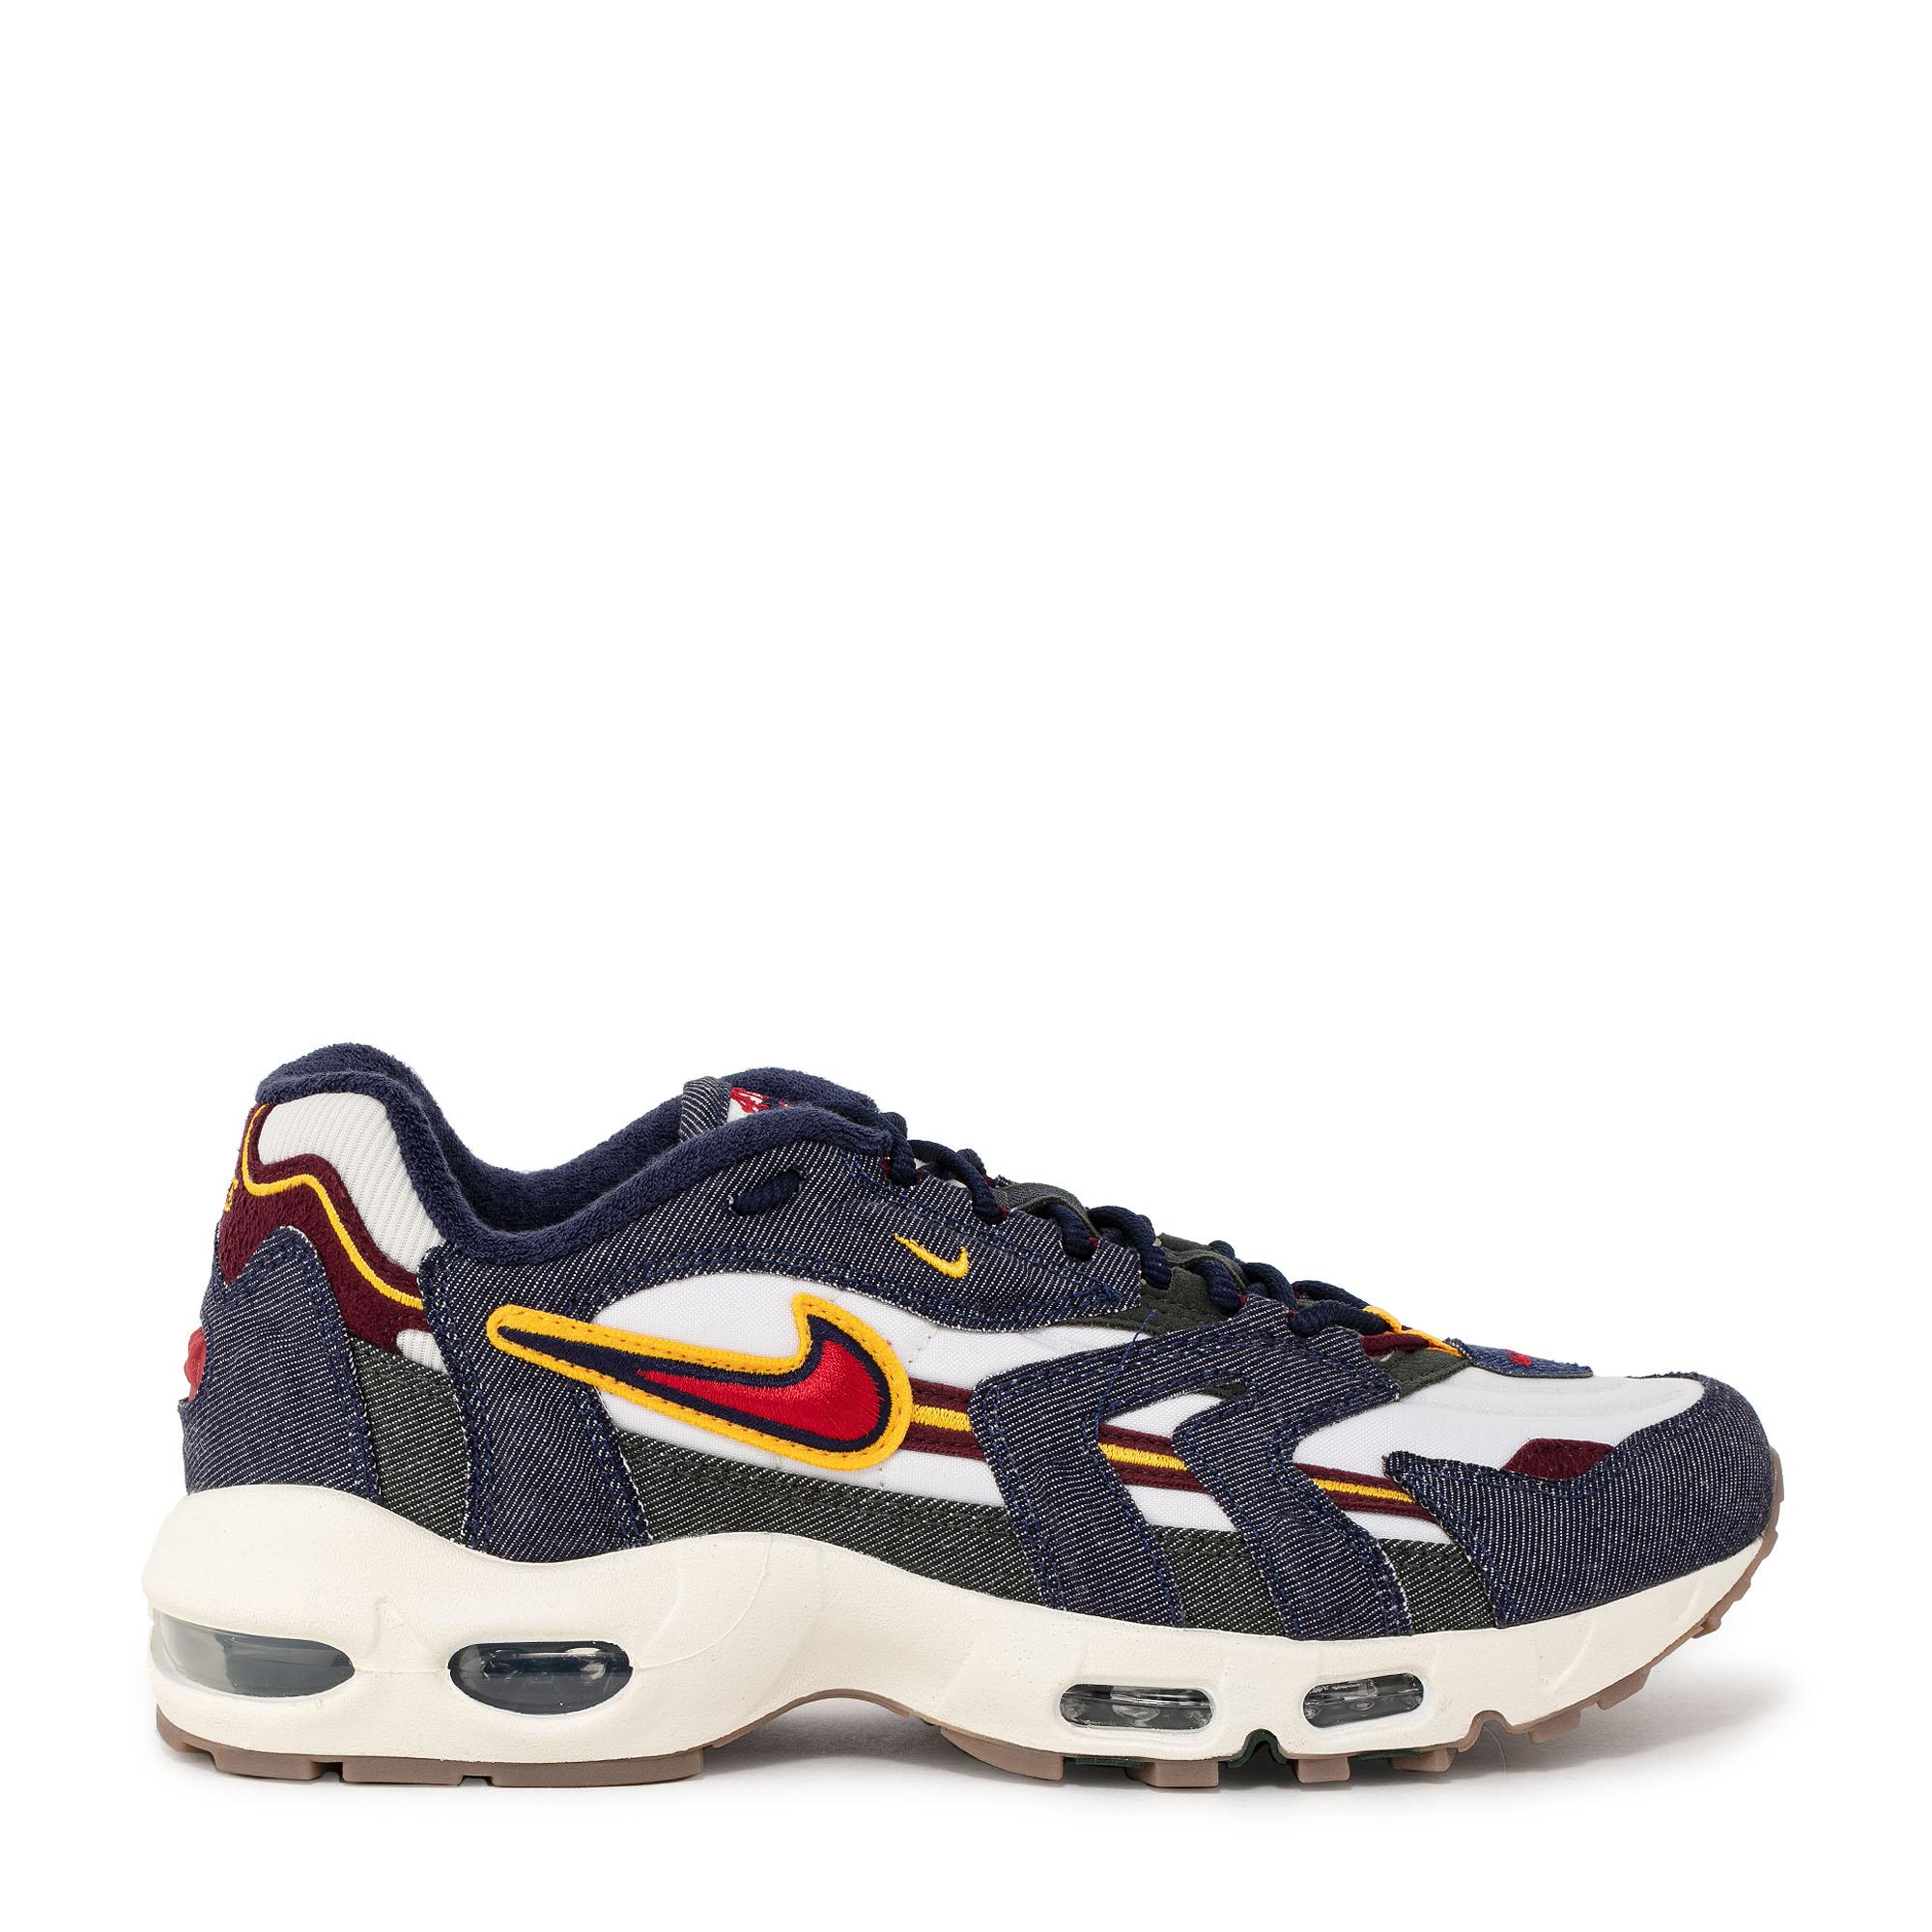 "Air Max 96 II QS ""Blackened Blue"" sneakers"